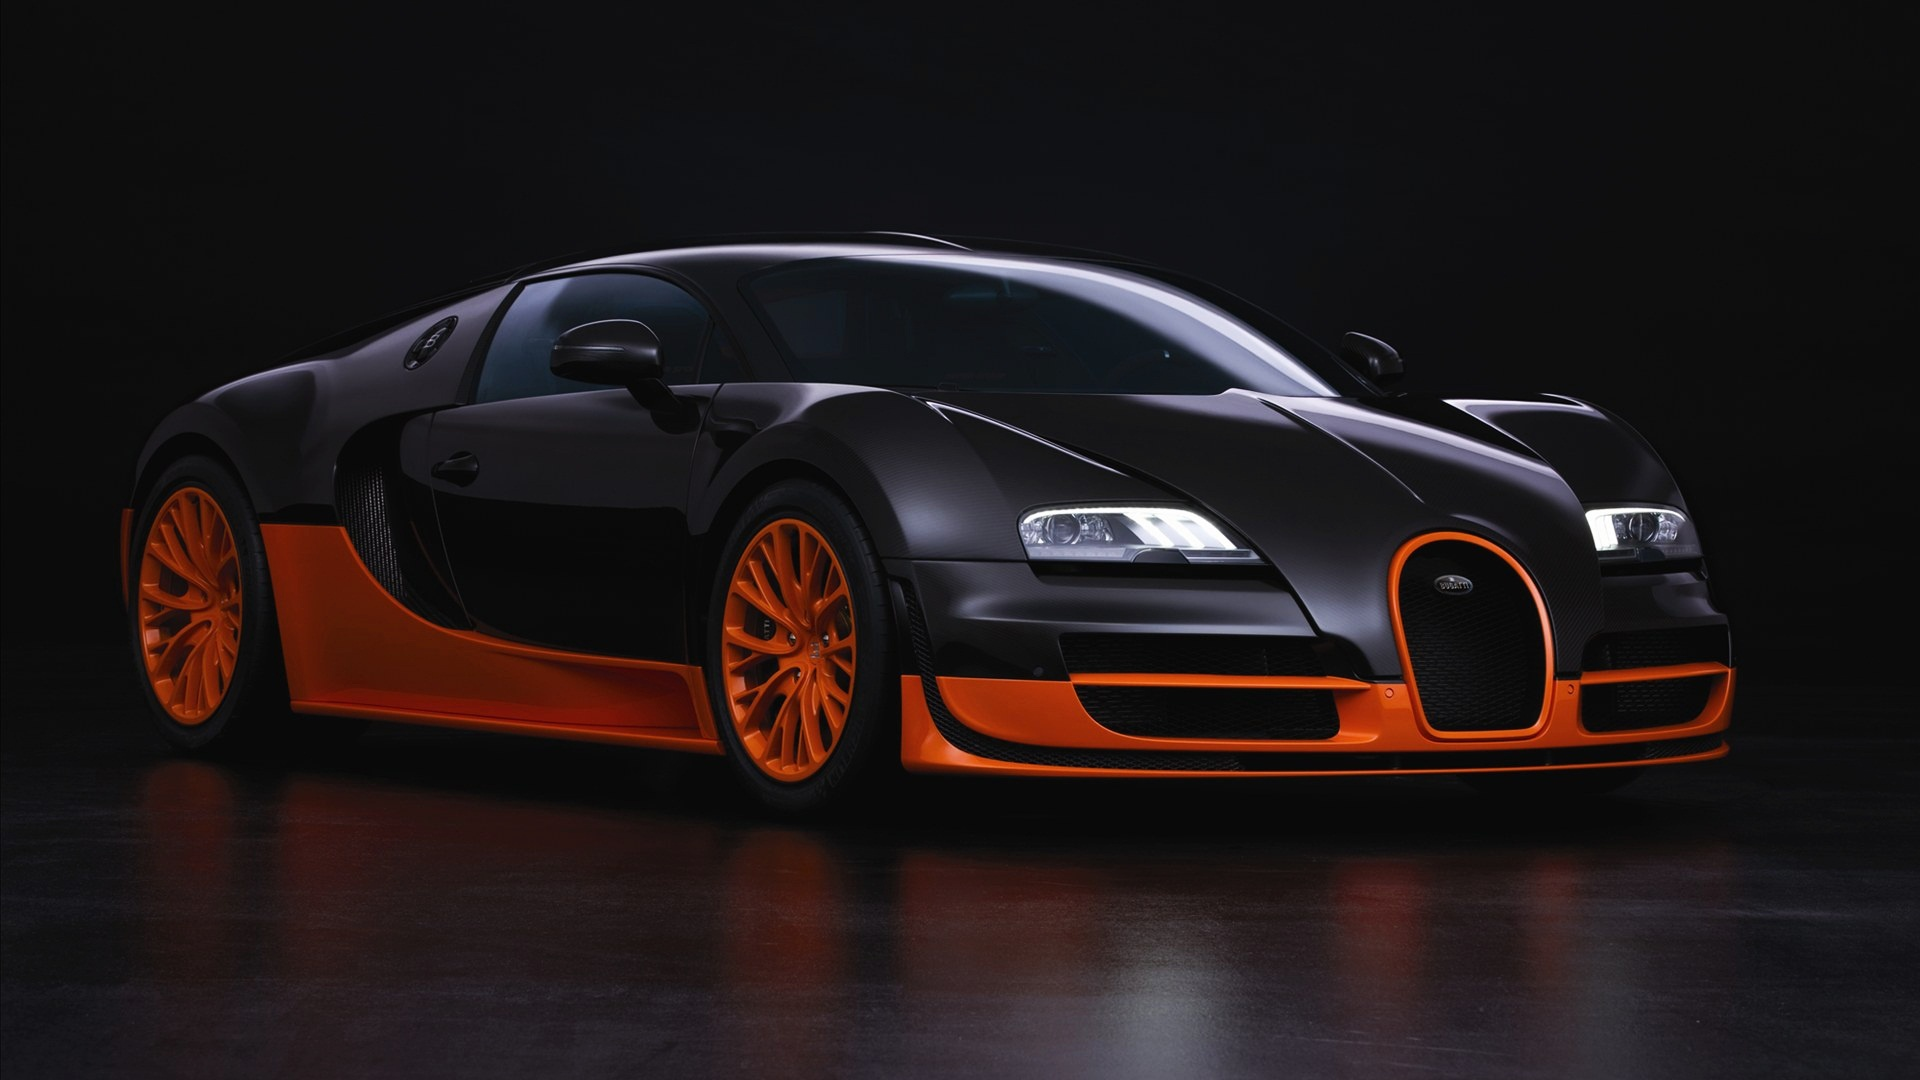 Description Bugatti Veyron Sports Wallpaper is a hi res Wallpaper for 1920x1080